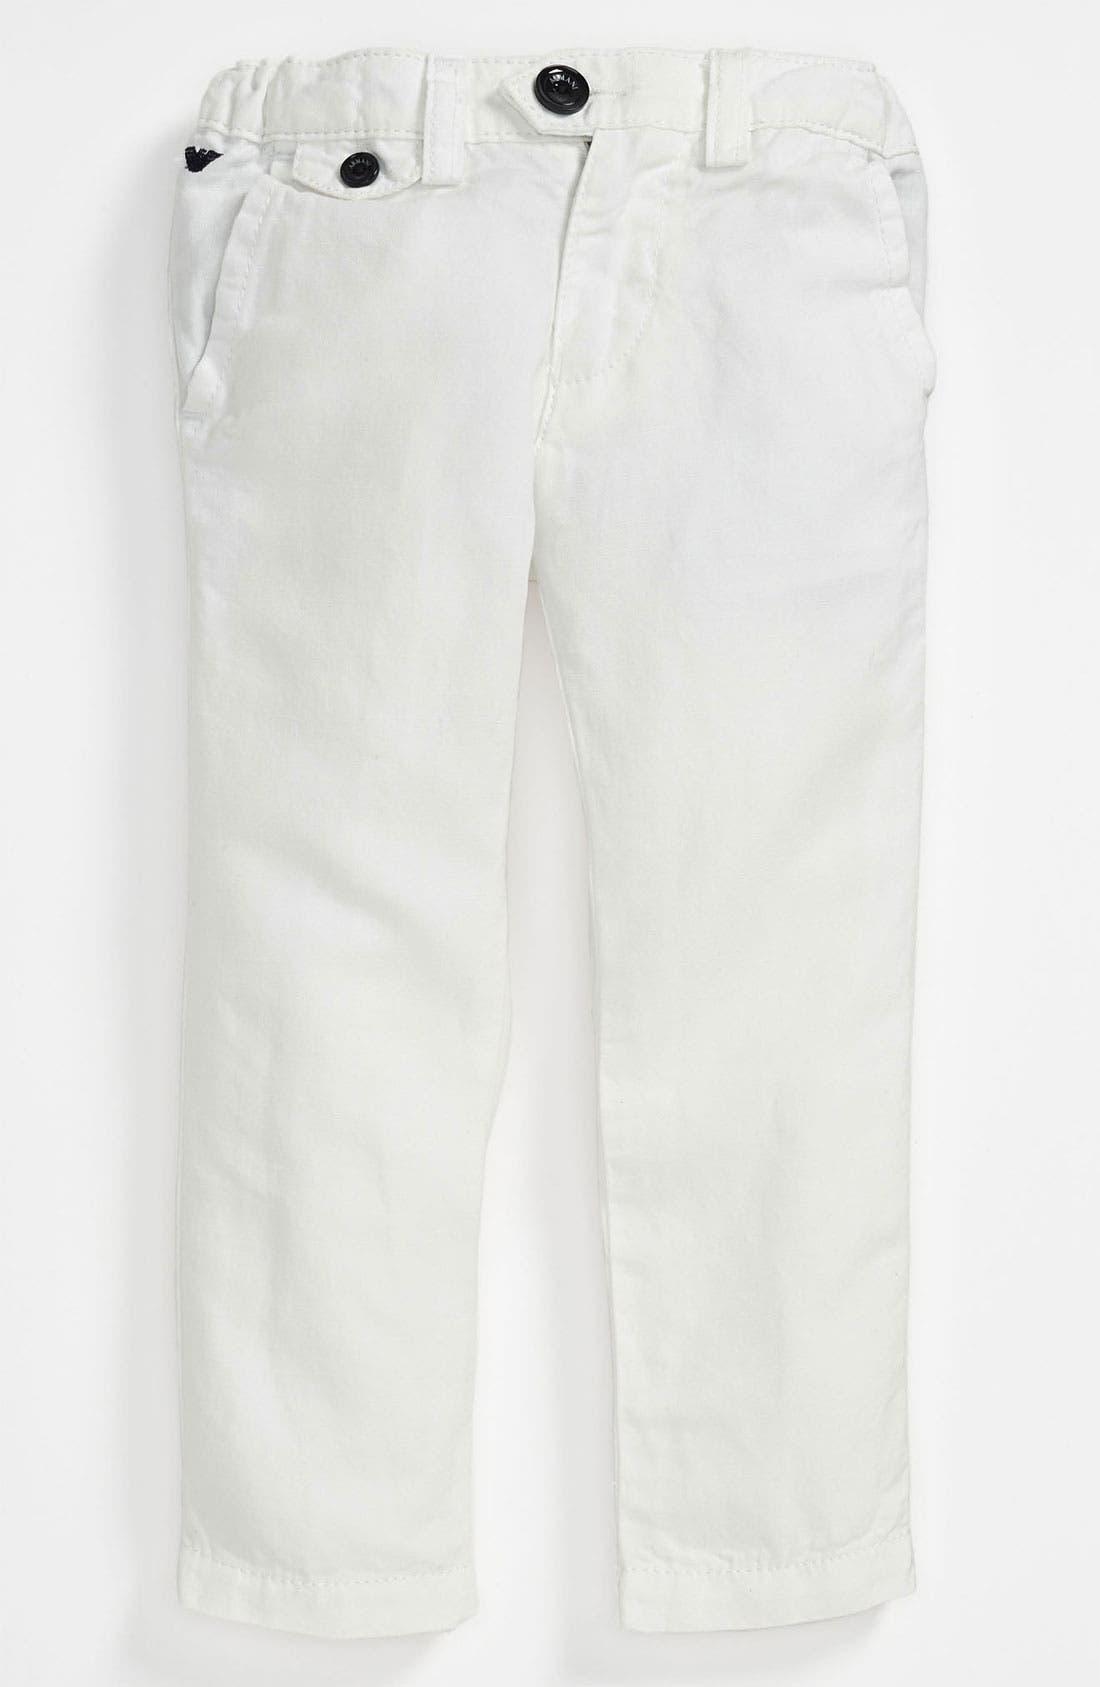 Alternate Image 1 Selected - Armani Junior Pants (Toddler & Little Boys)